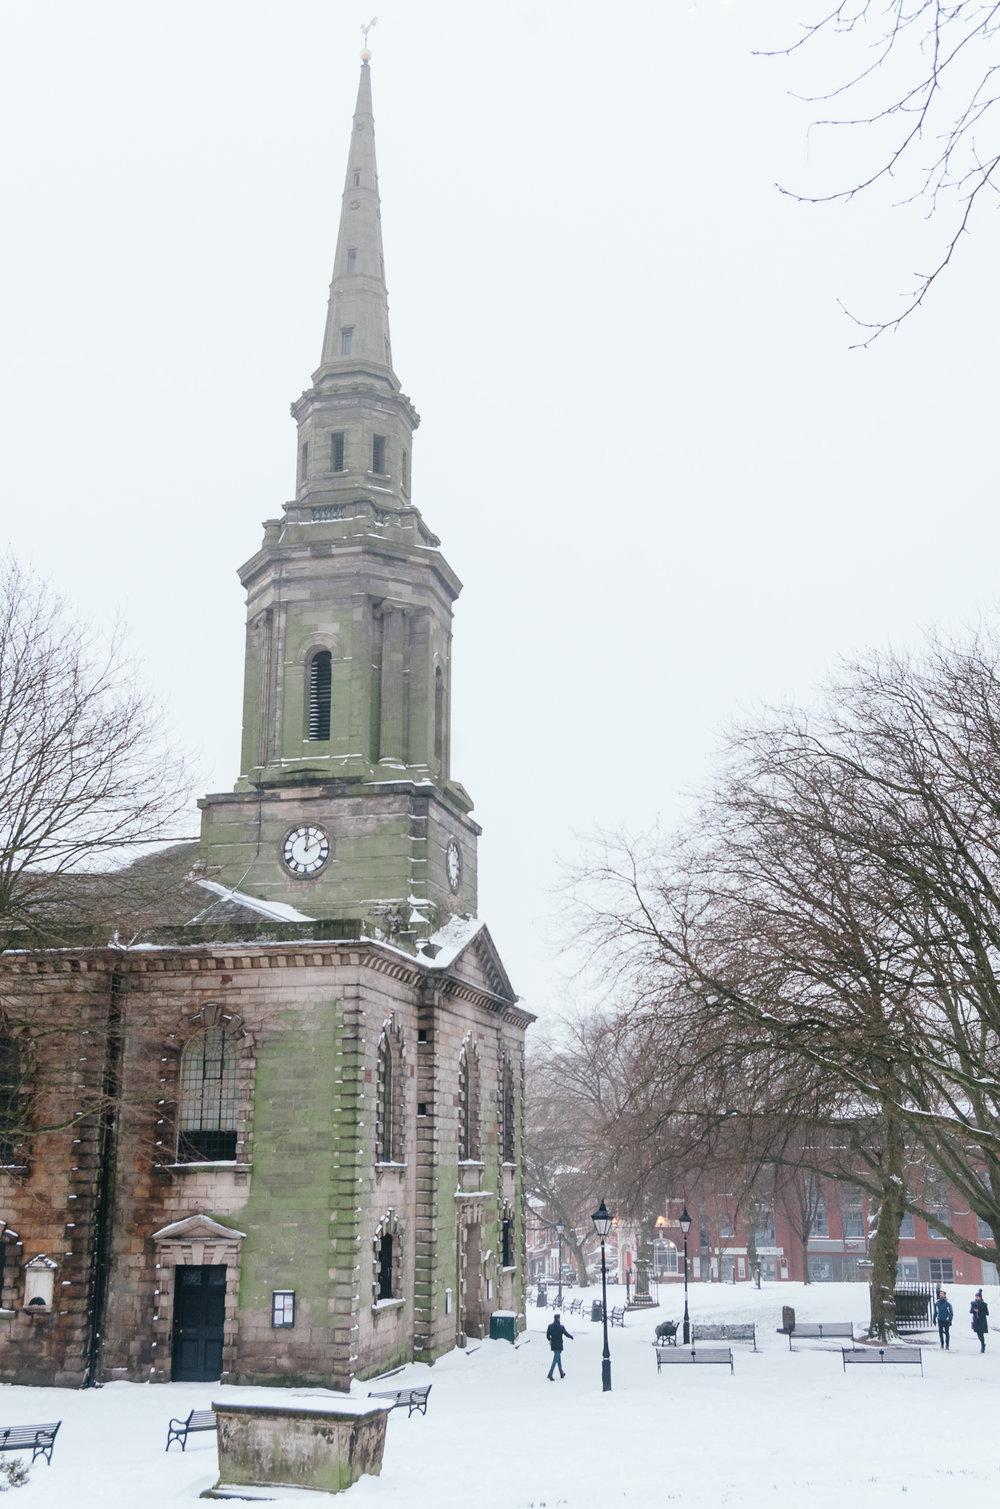 Birmingham-Snow-Fog-Winter-20180303-0088-Hanny-Foxhall.jpg